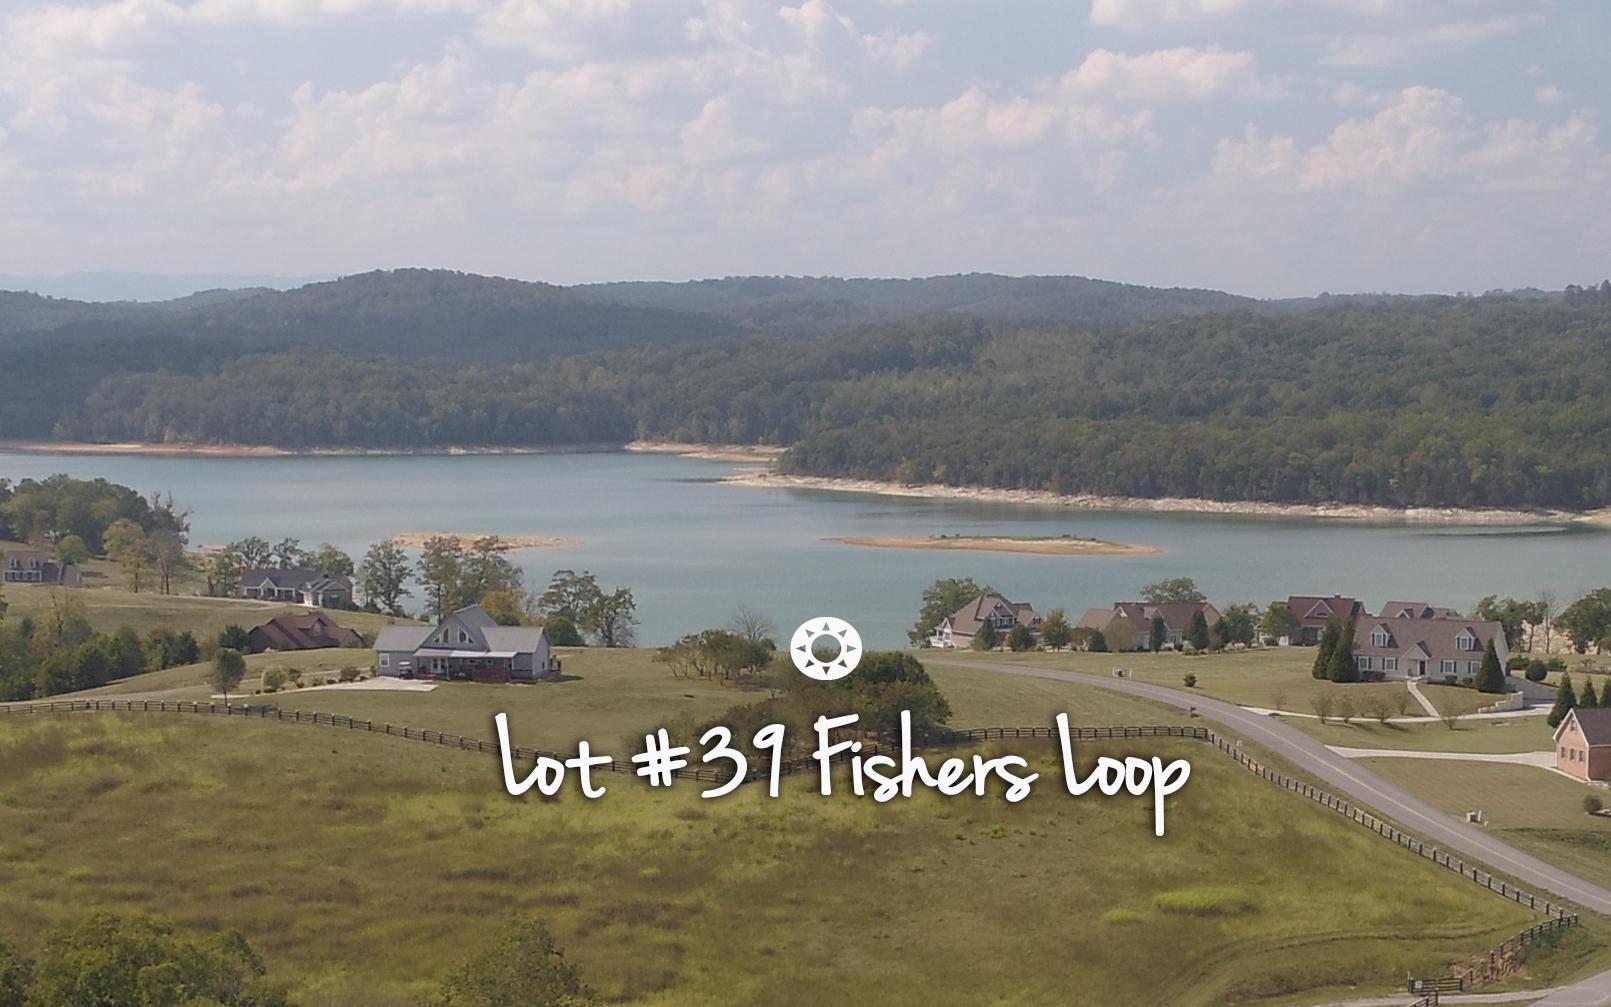 Lot 39 Fishers Loop